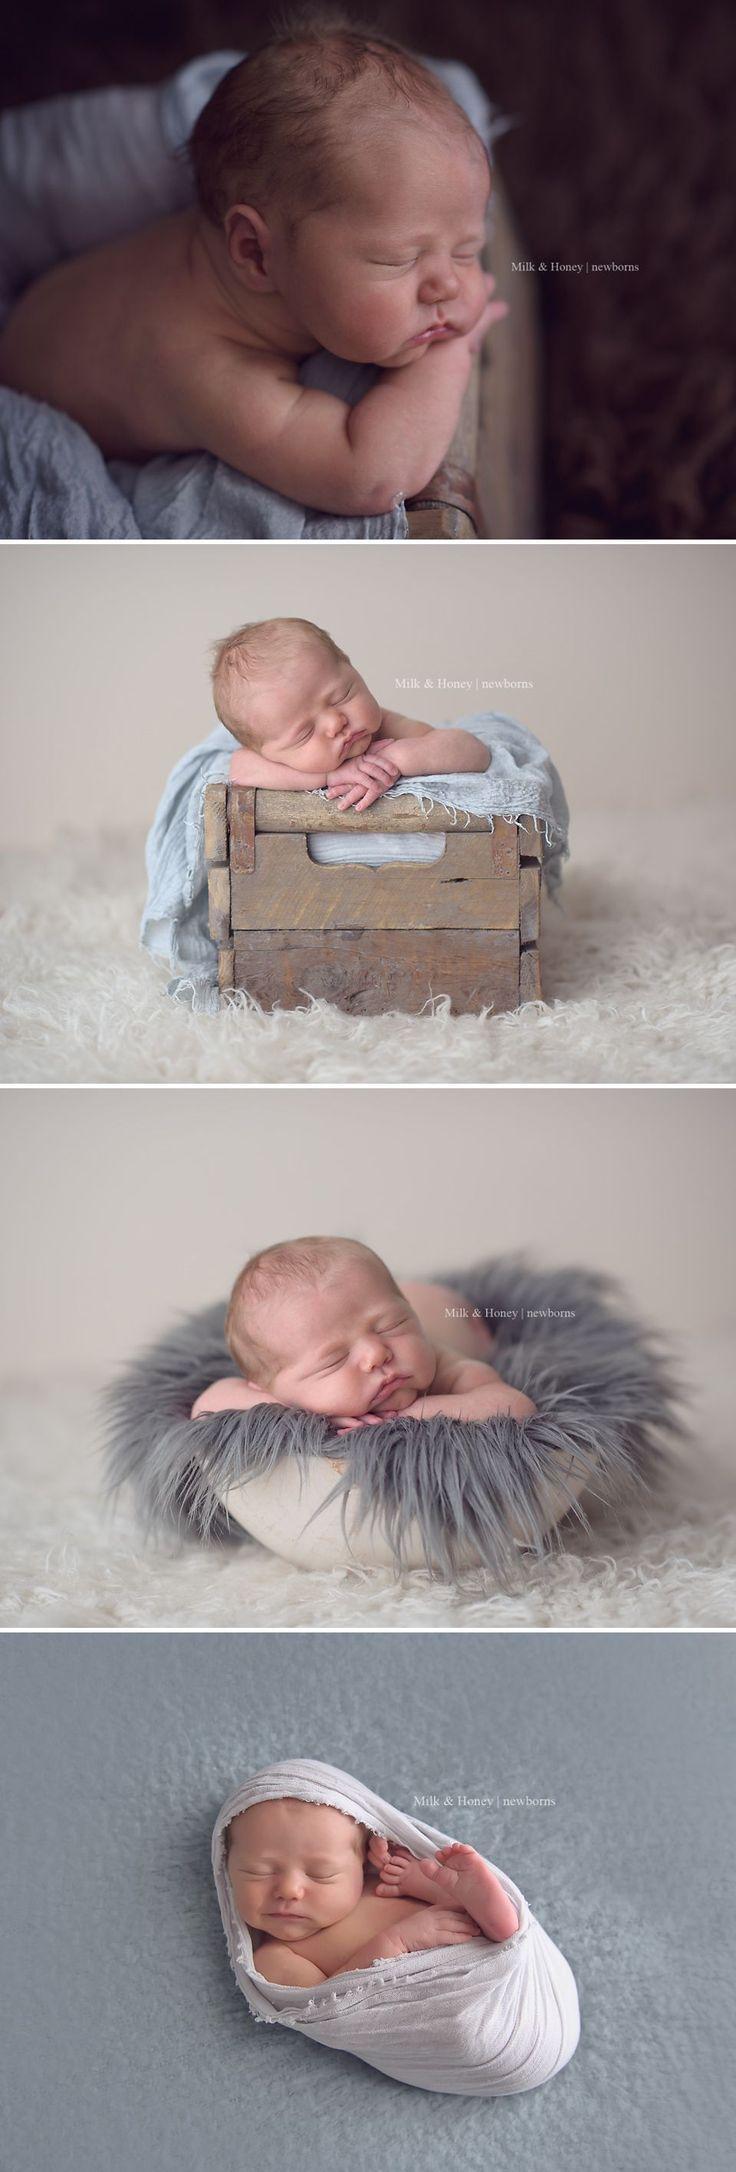 Grey and cream tones for newborn session - milkandhoneyphotography.ca Like & Repin. Noelito Flow. Noel songs. follow my links http://www.instagram.com/noelitoflow